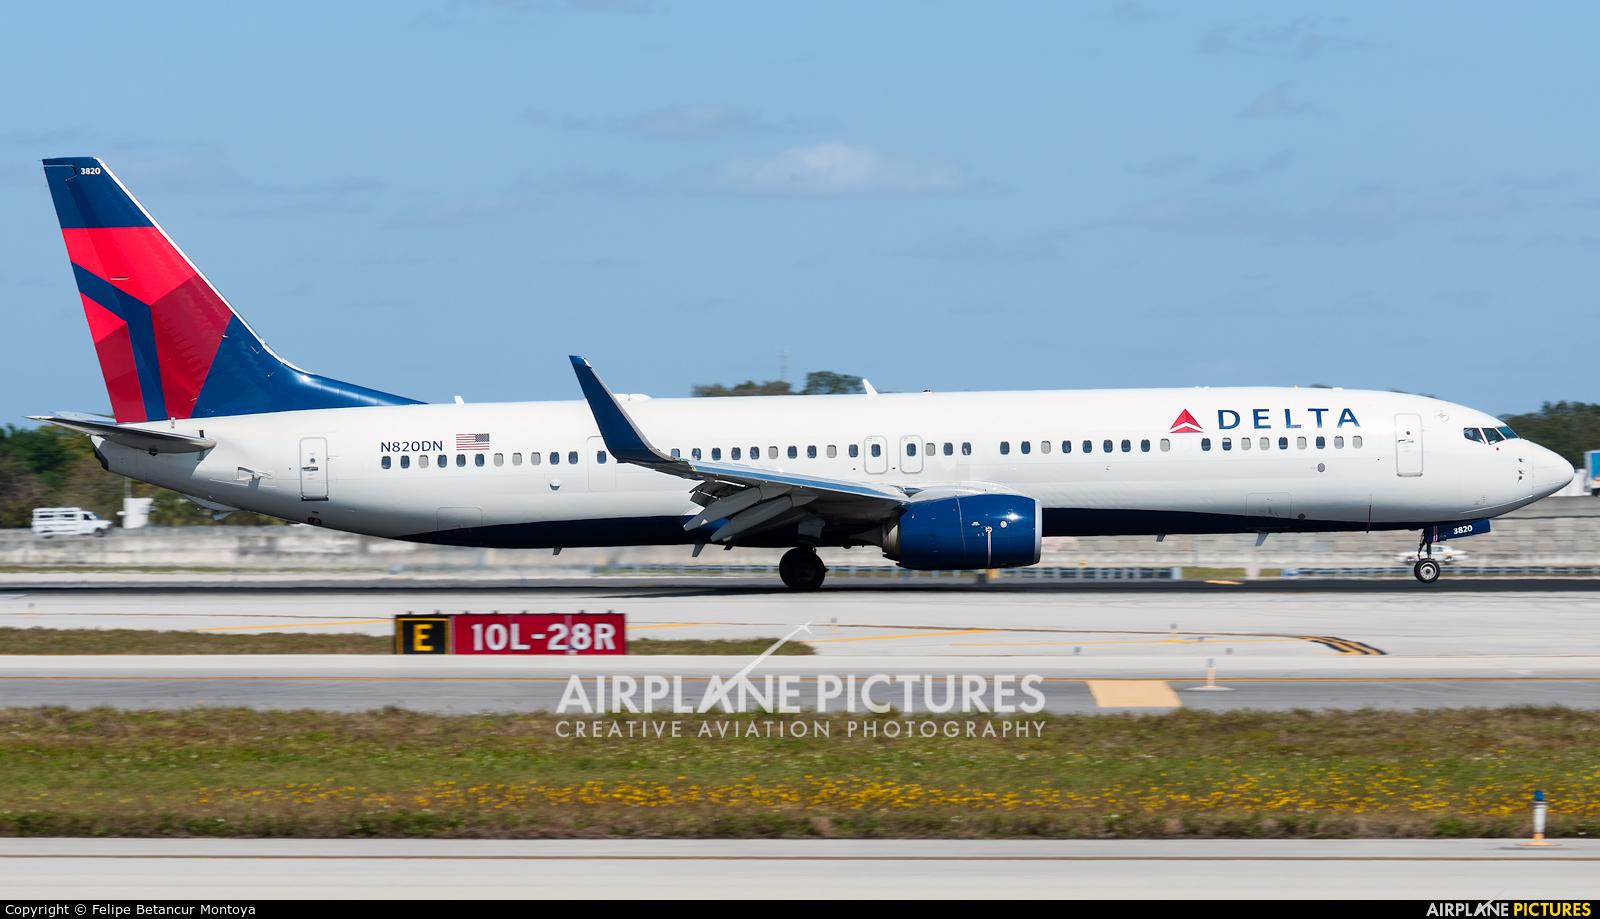 Delta Air Lines N820DN aircraft at Fort Lauderdale - Hollywood Intl